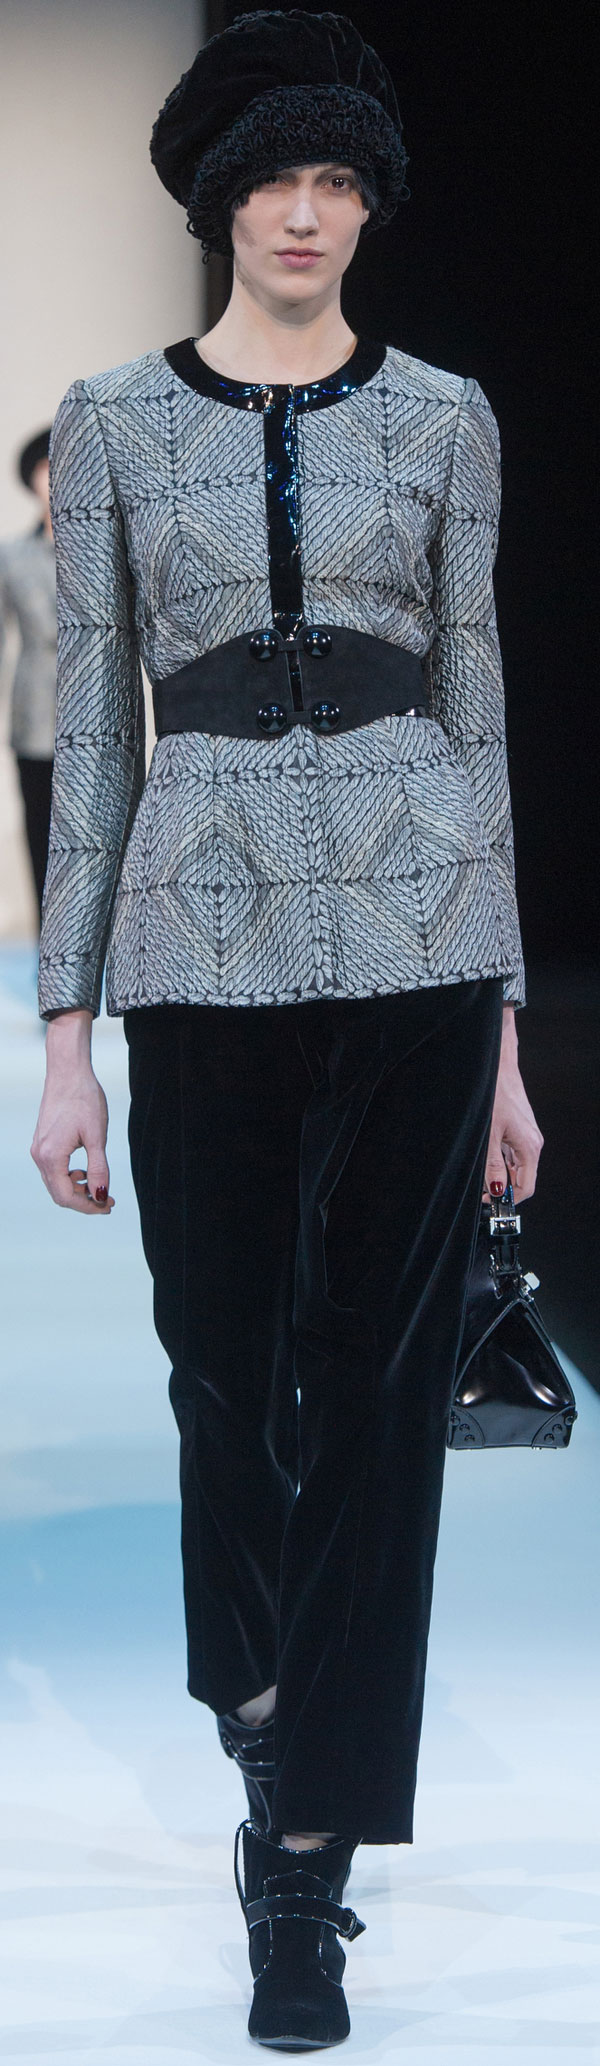 Armani Semana Moda de Milan